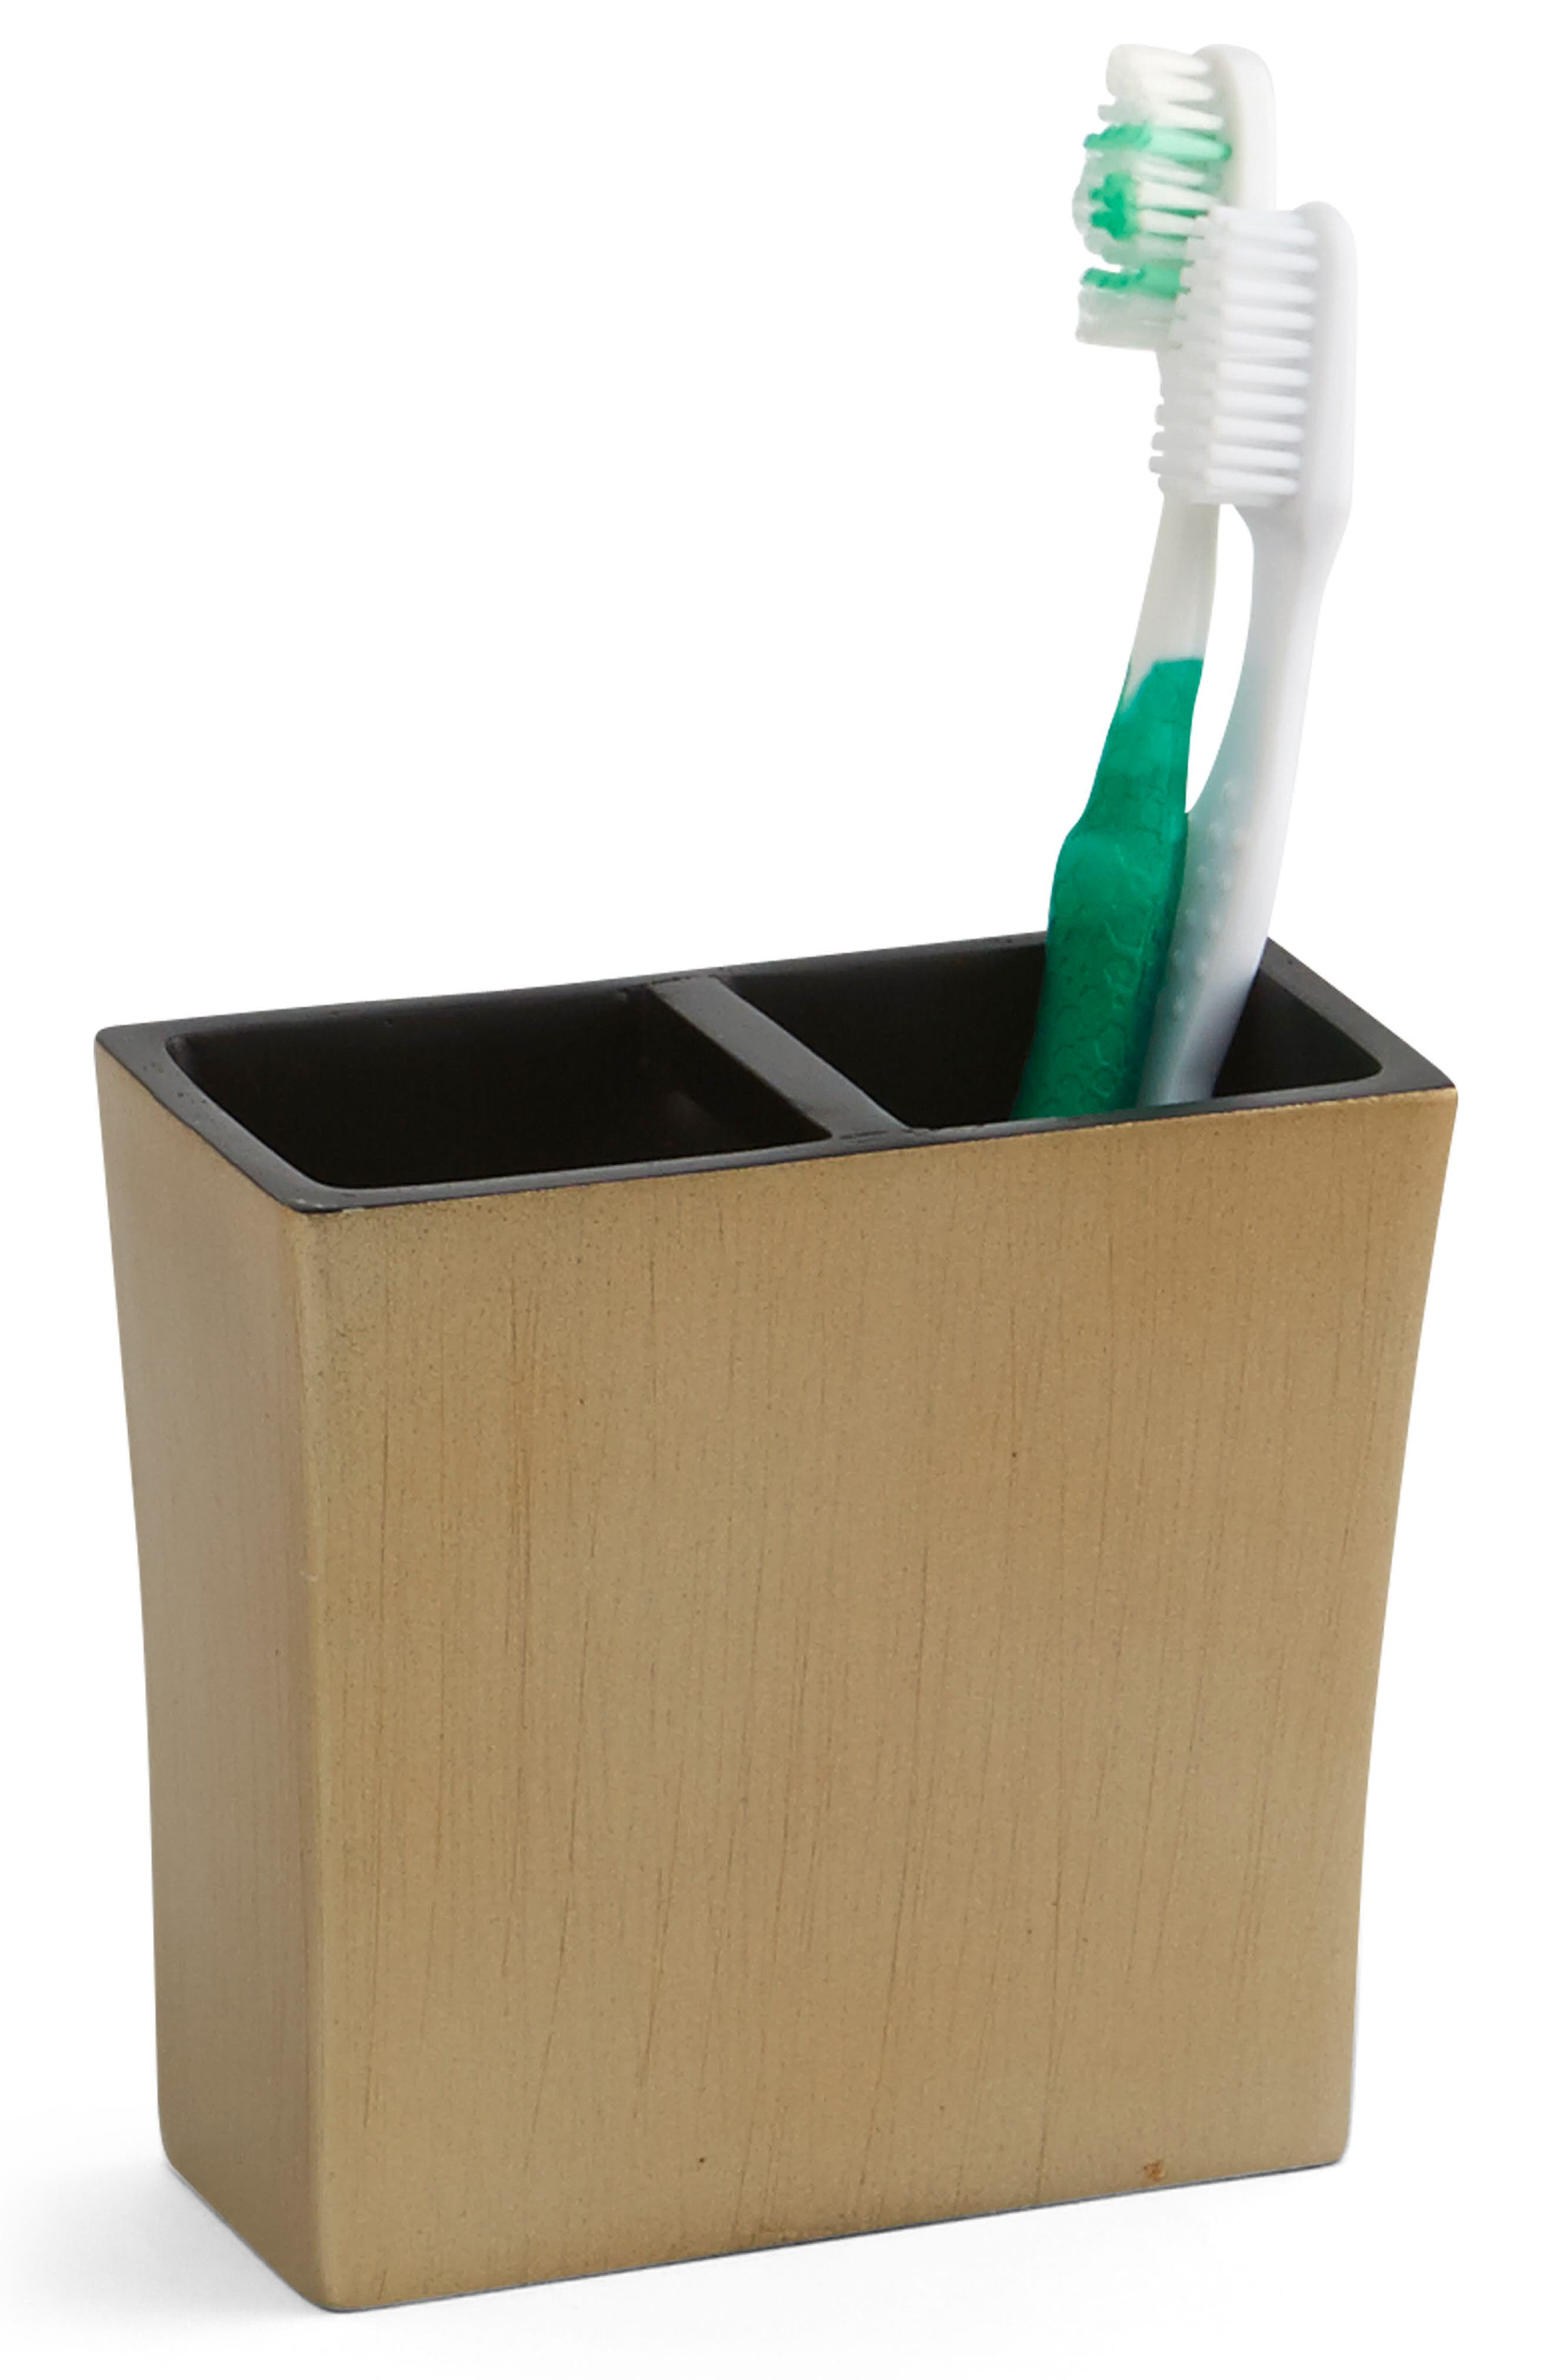 Paradigm Trends Cooper Toothbrush Holder